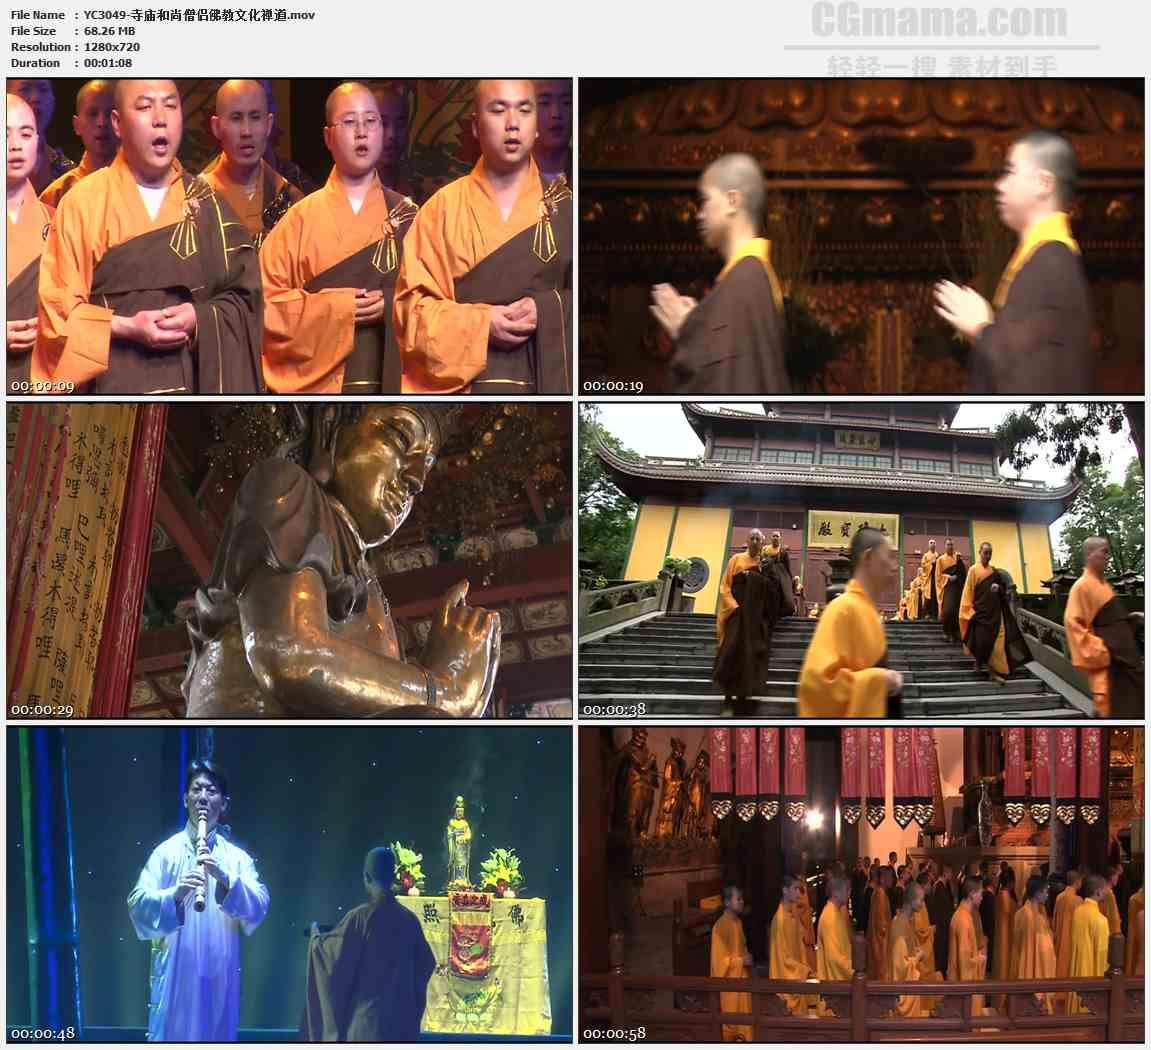 YC3049-寺庙和尚僧侣佛教文化禅道高清实拍视频素材